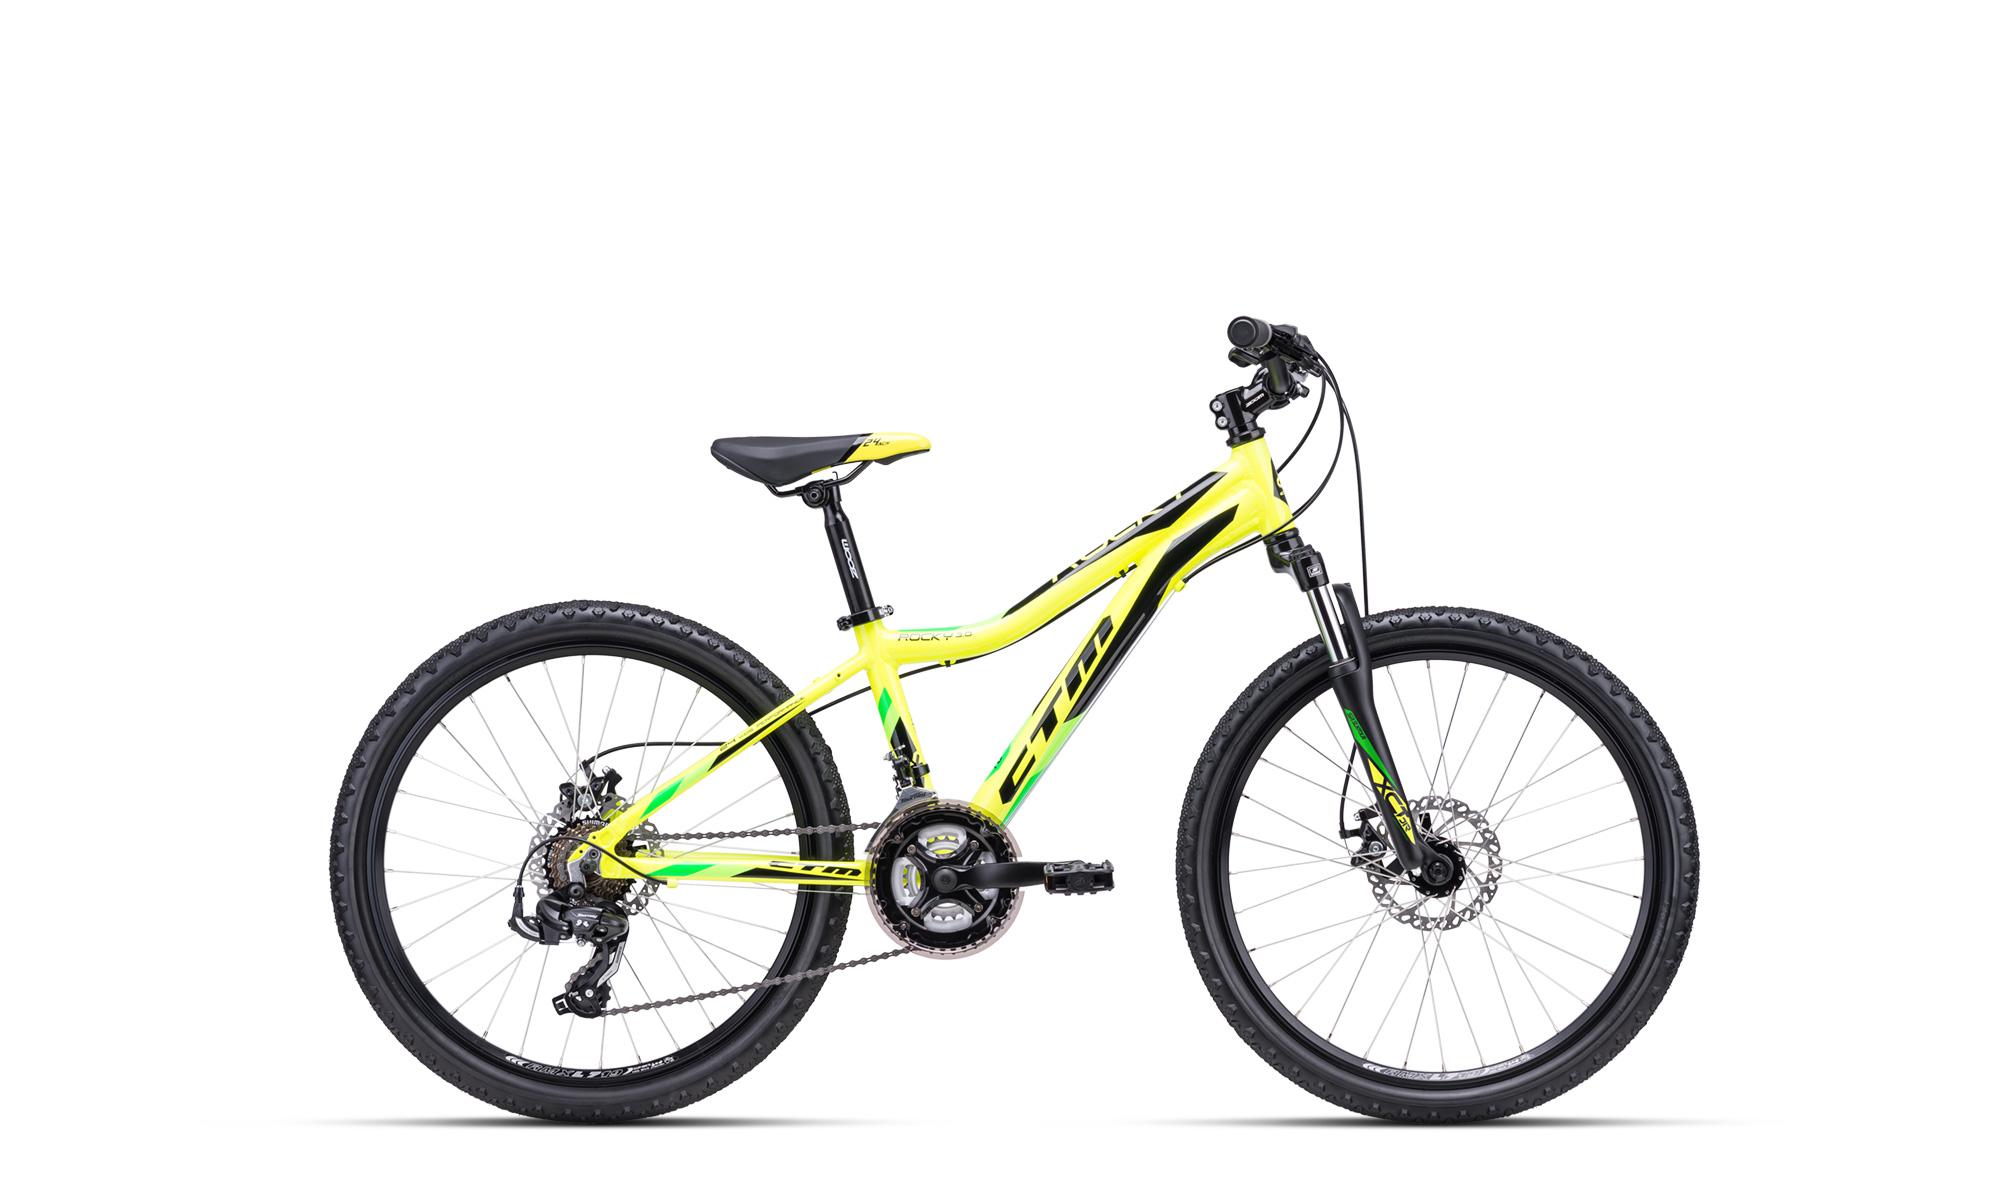 Ht Mtb Fahrrad 26 Zoll in 2491 Zillingdorf Bergwerk für